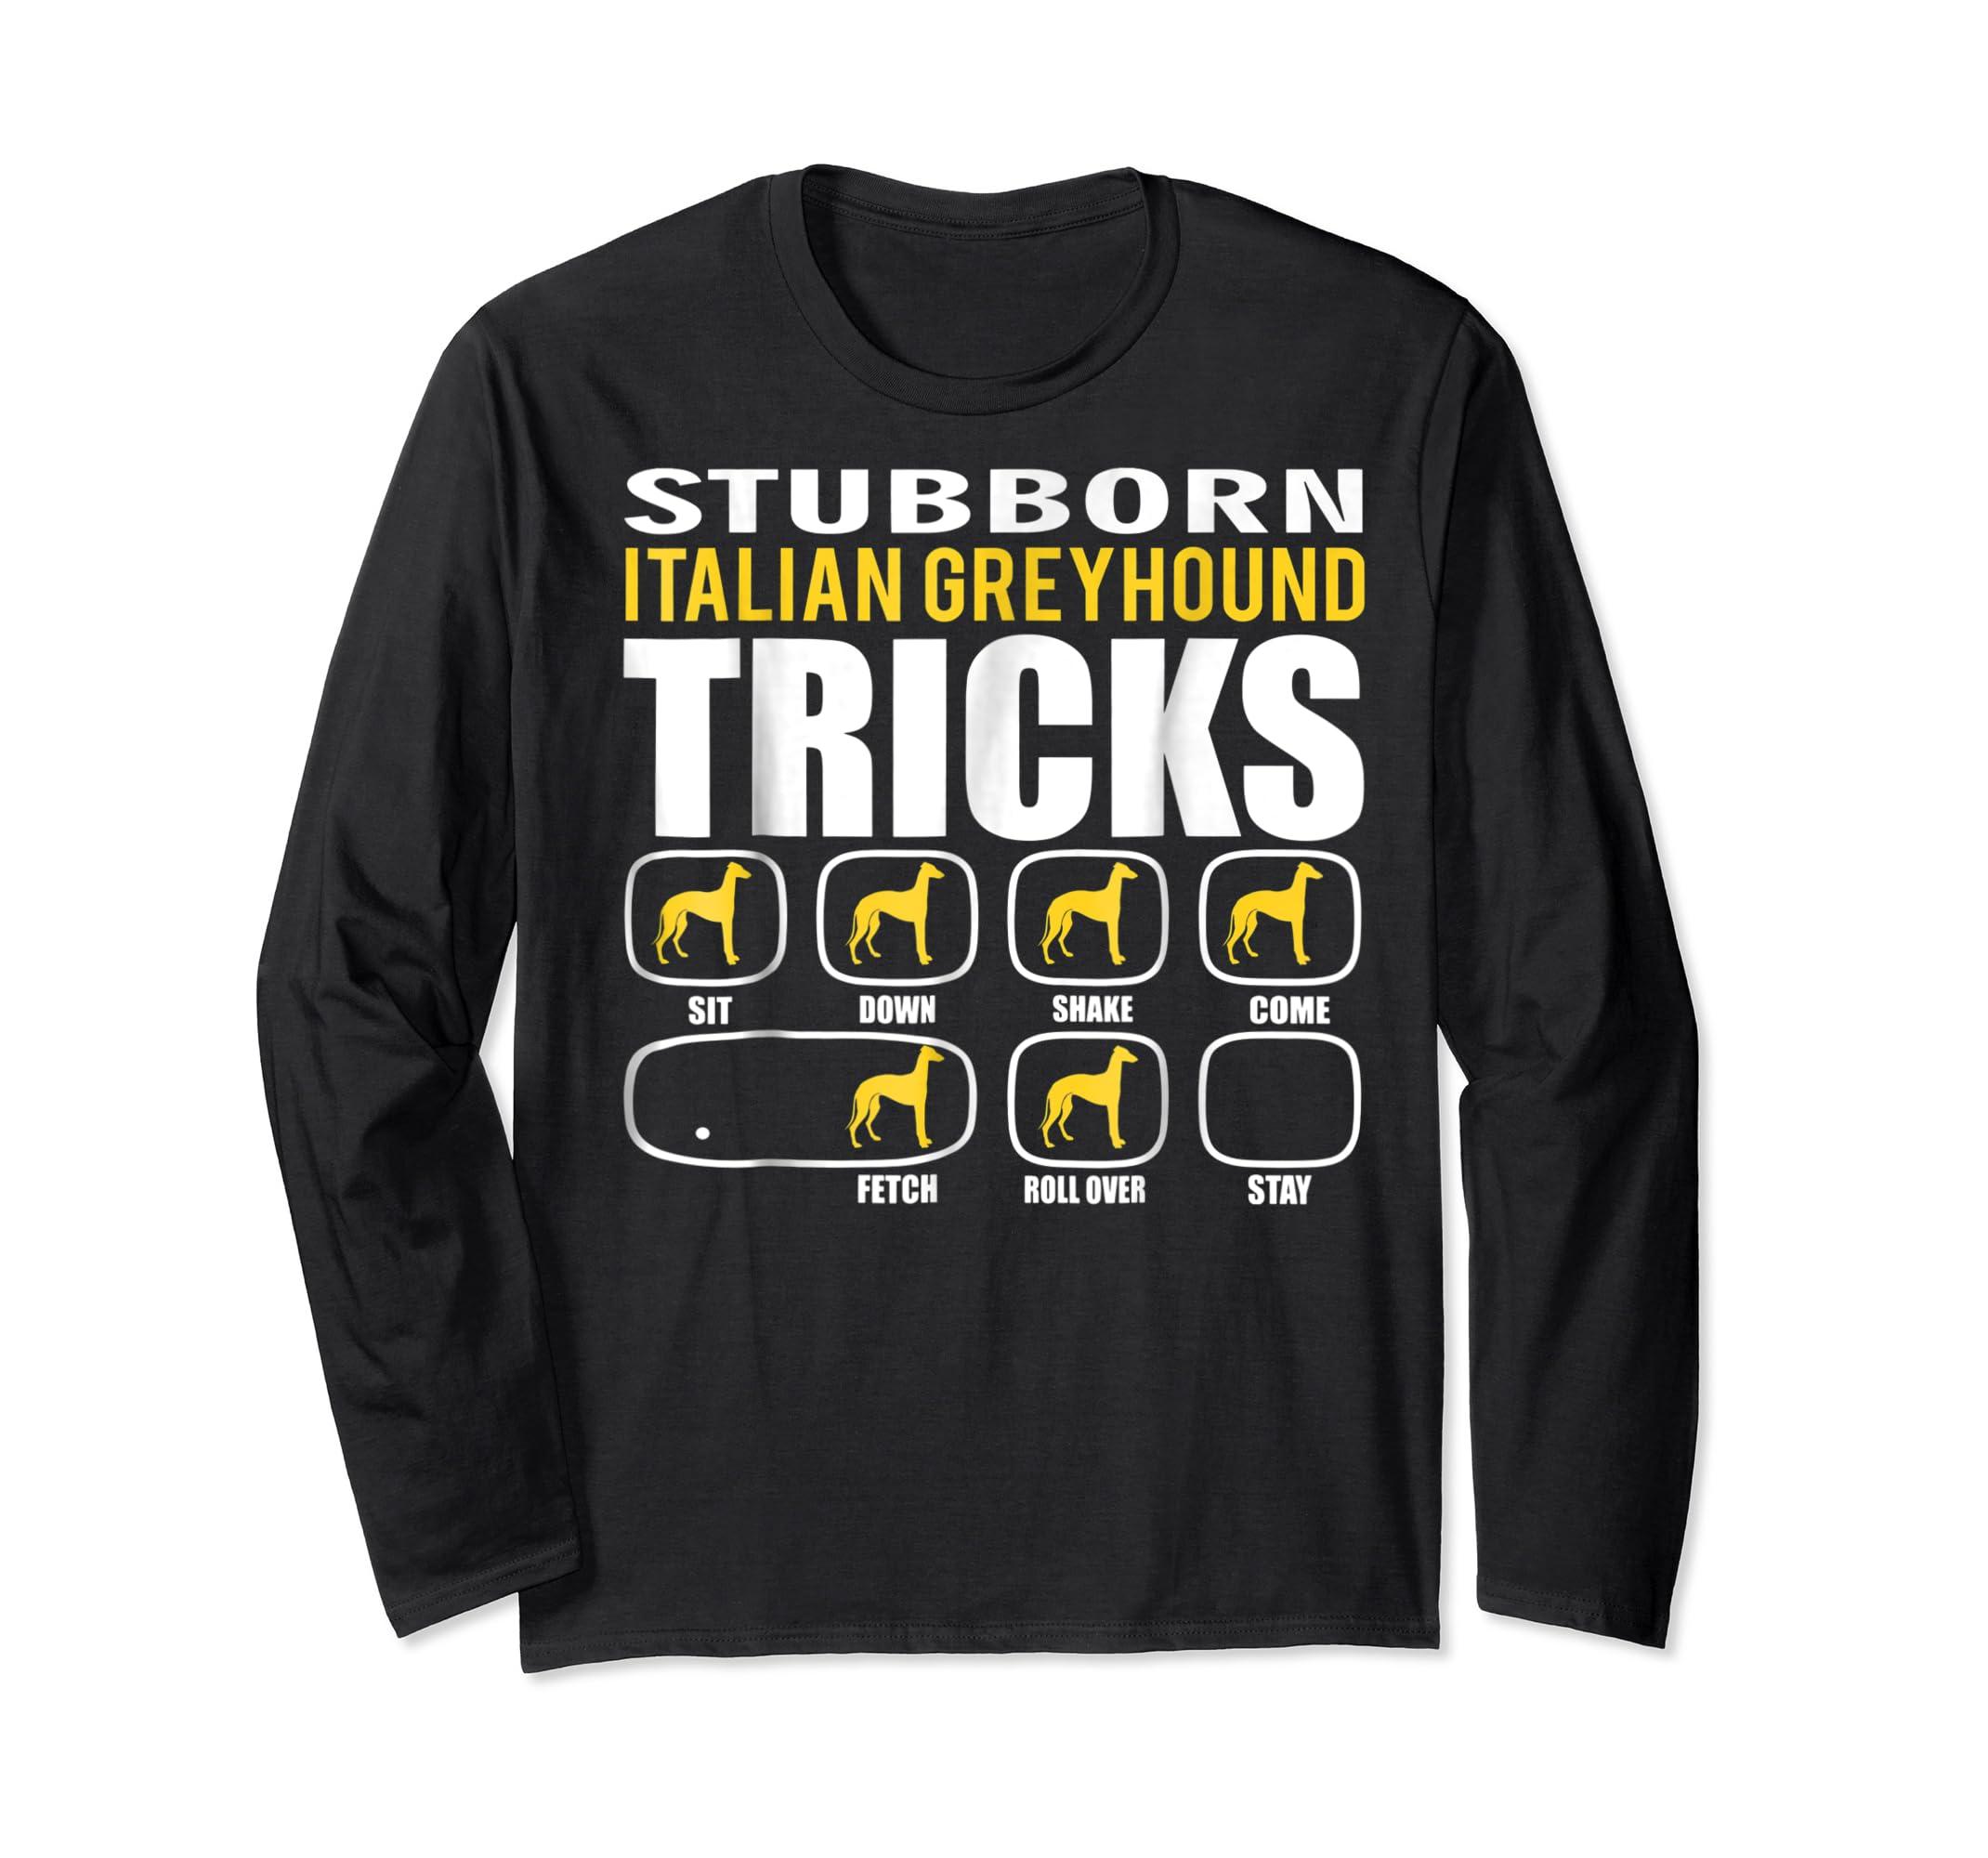 Funny Stubborn Italian Greyhound Tricks T-Shirt-Long Sleeve-Black